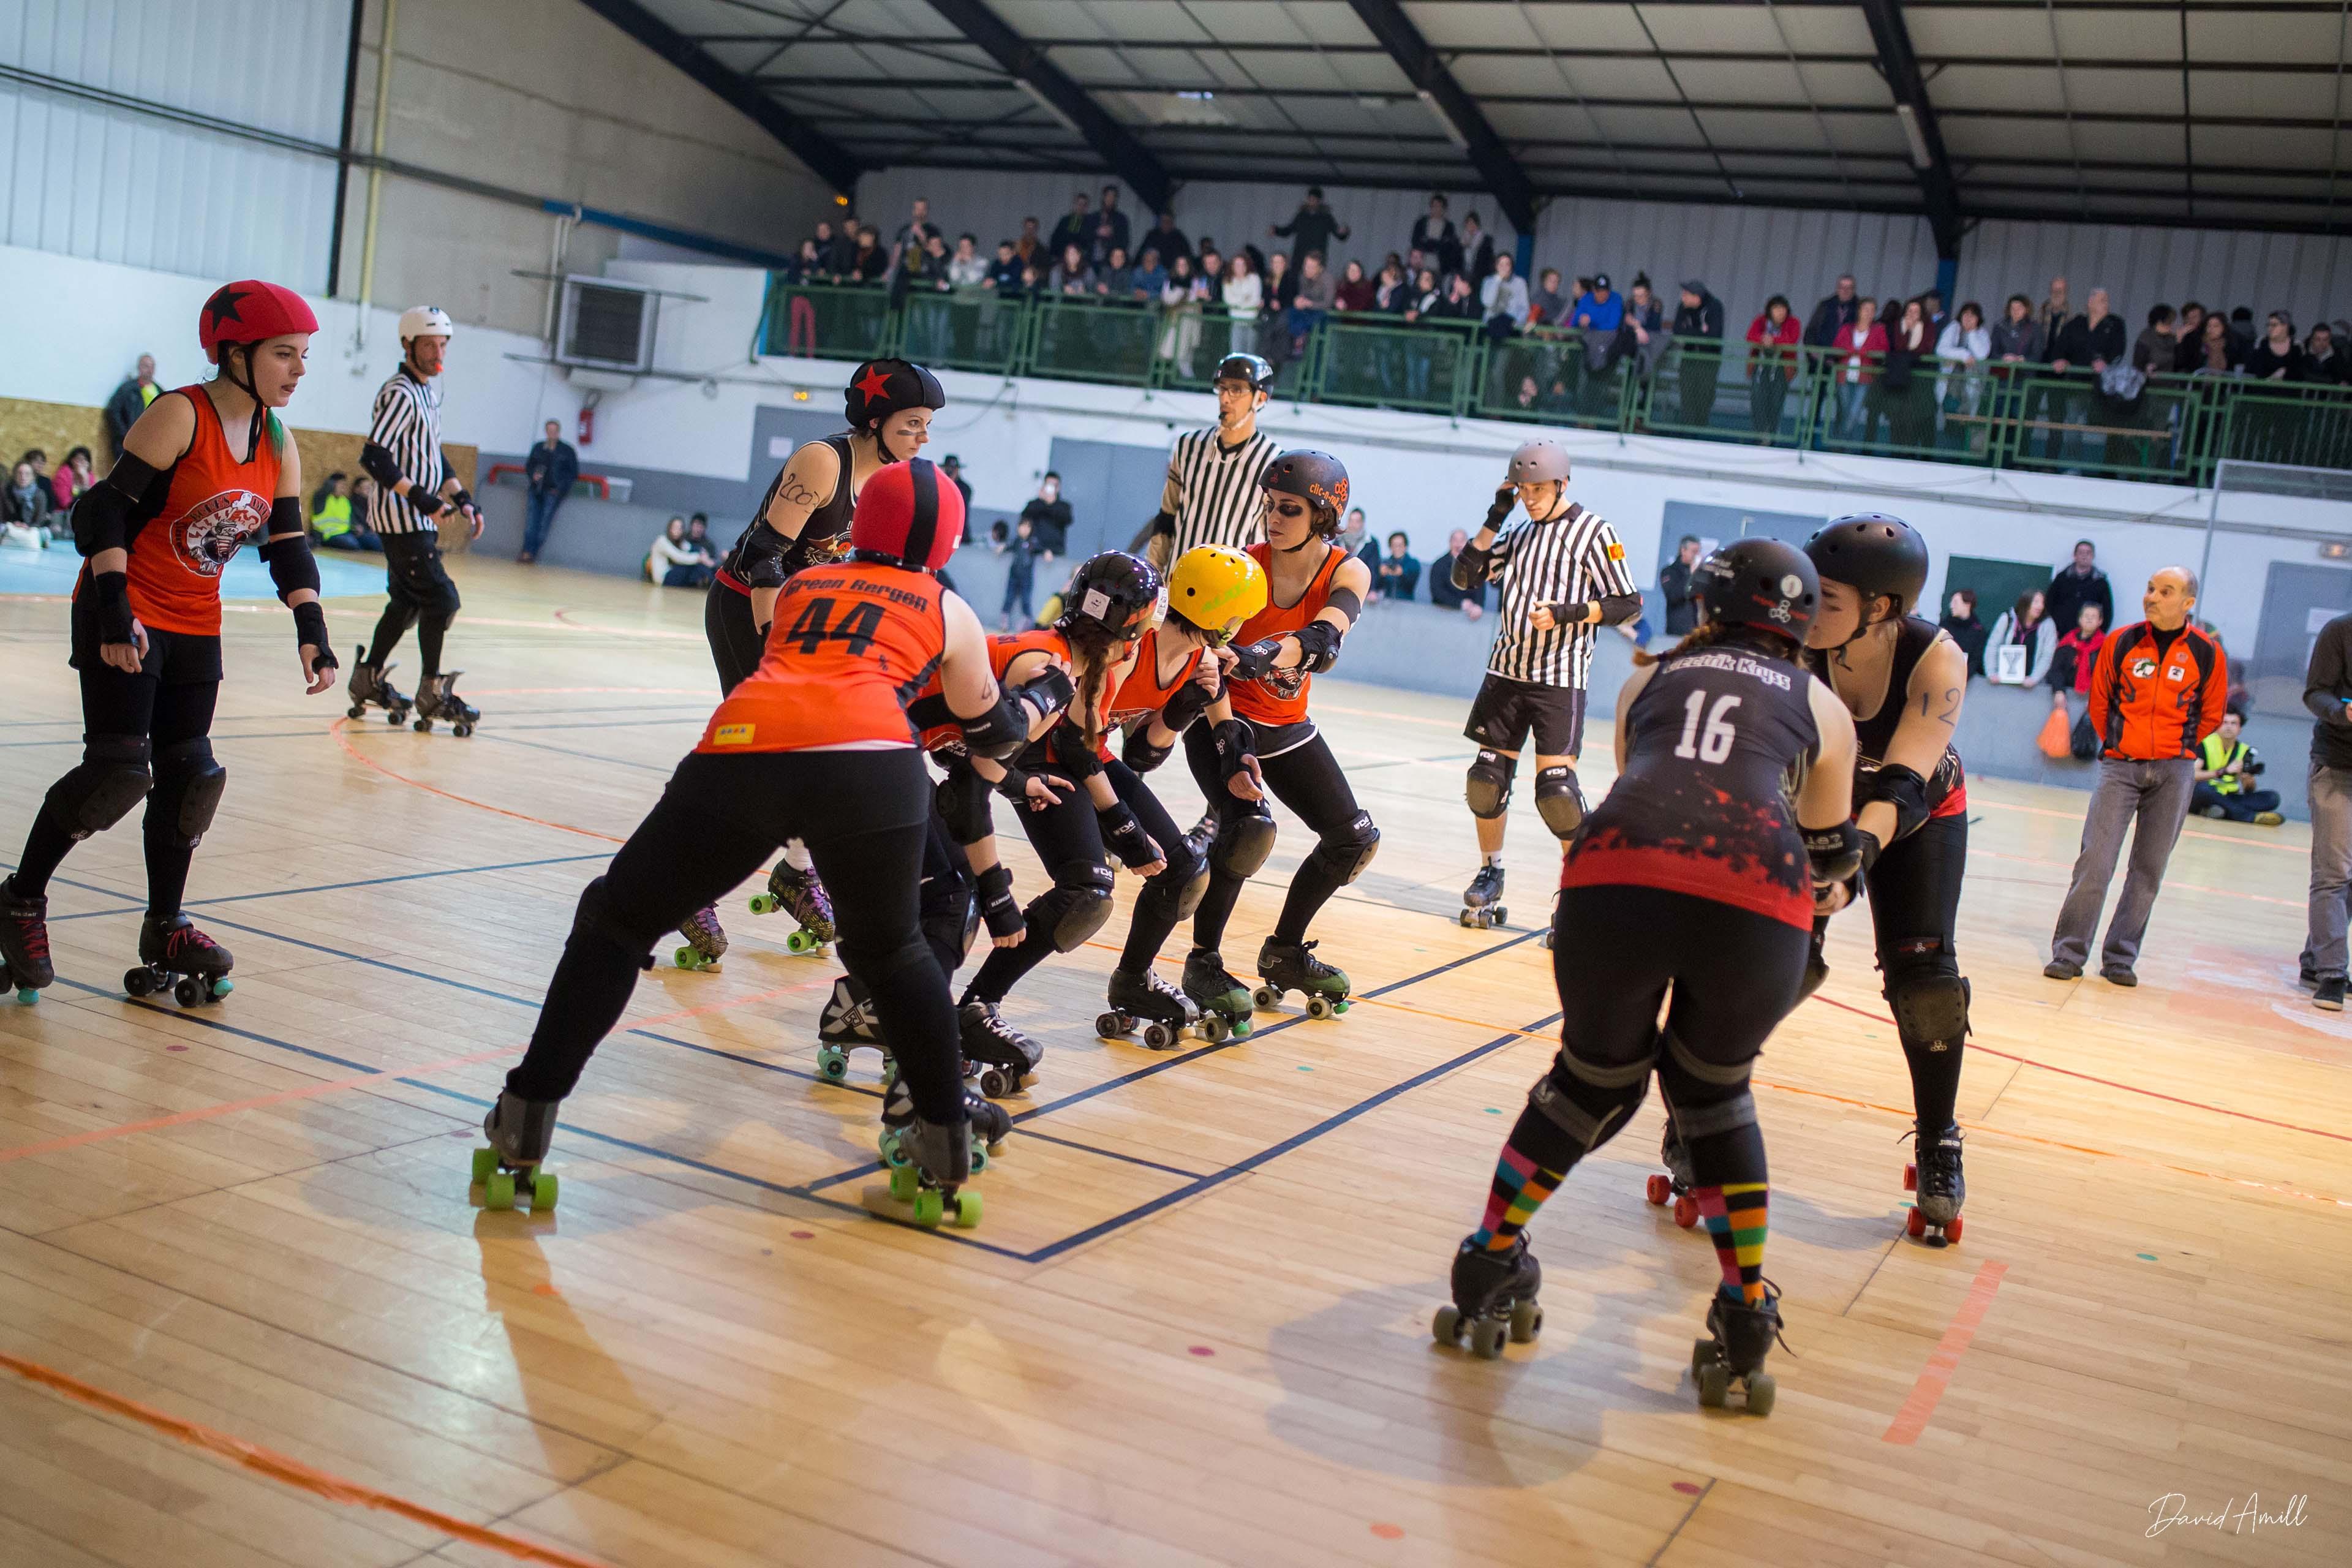 Bones Breaker Roller Derby